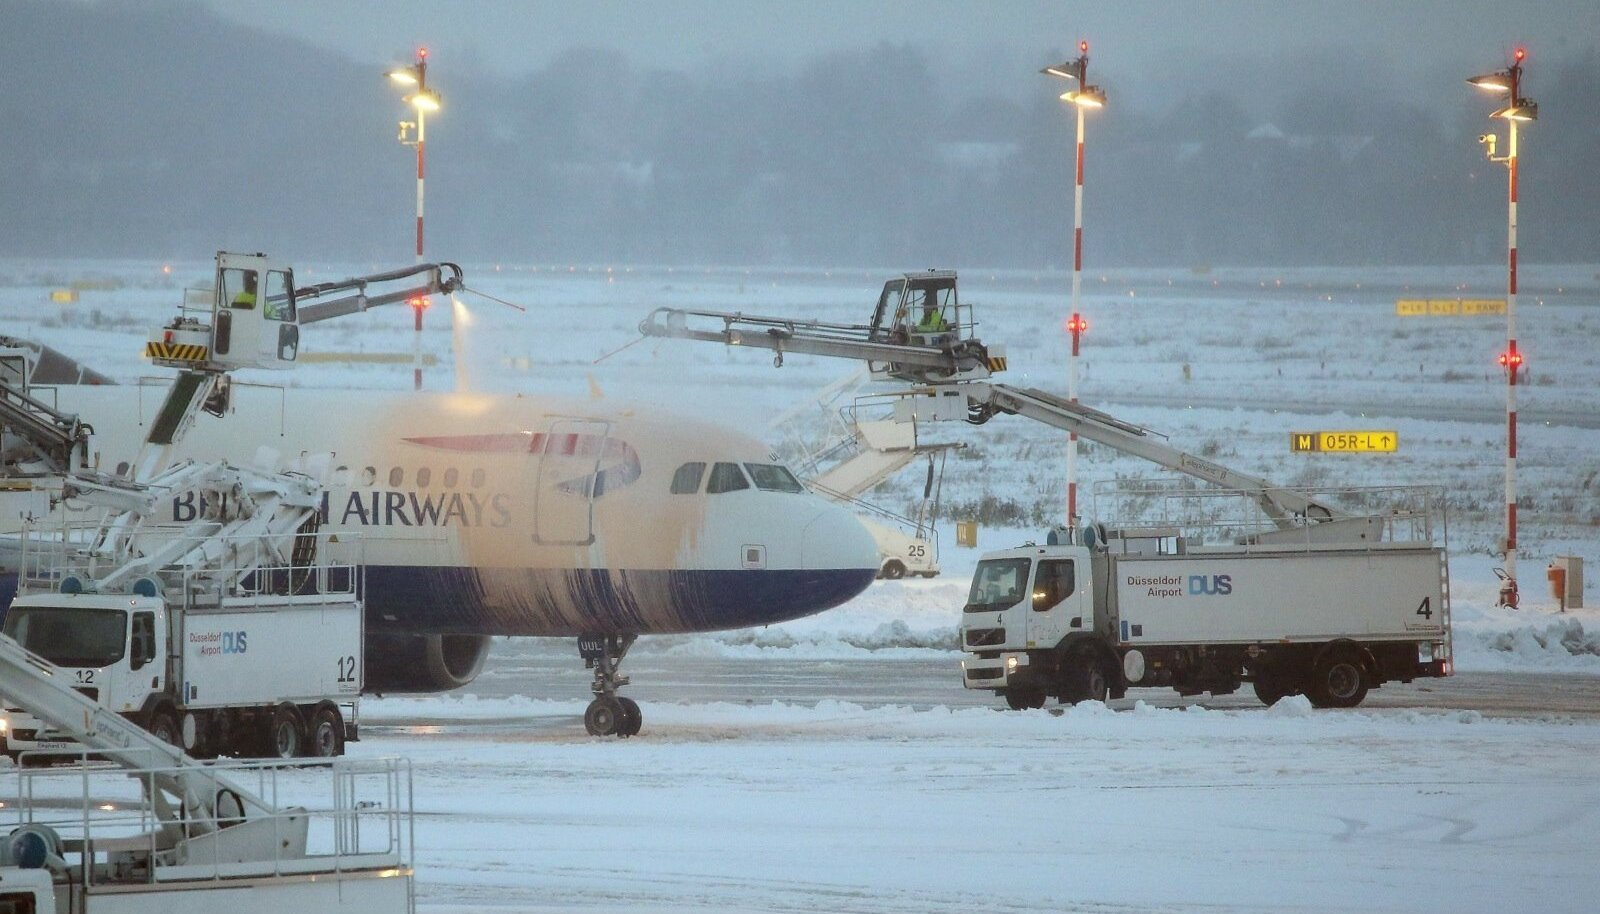 Lumi eile Düsseldorfi lennujaamas